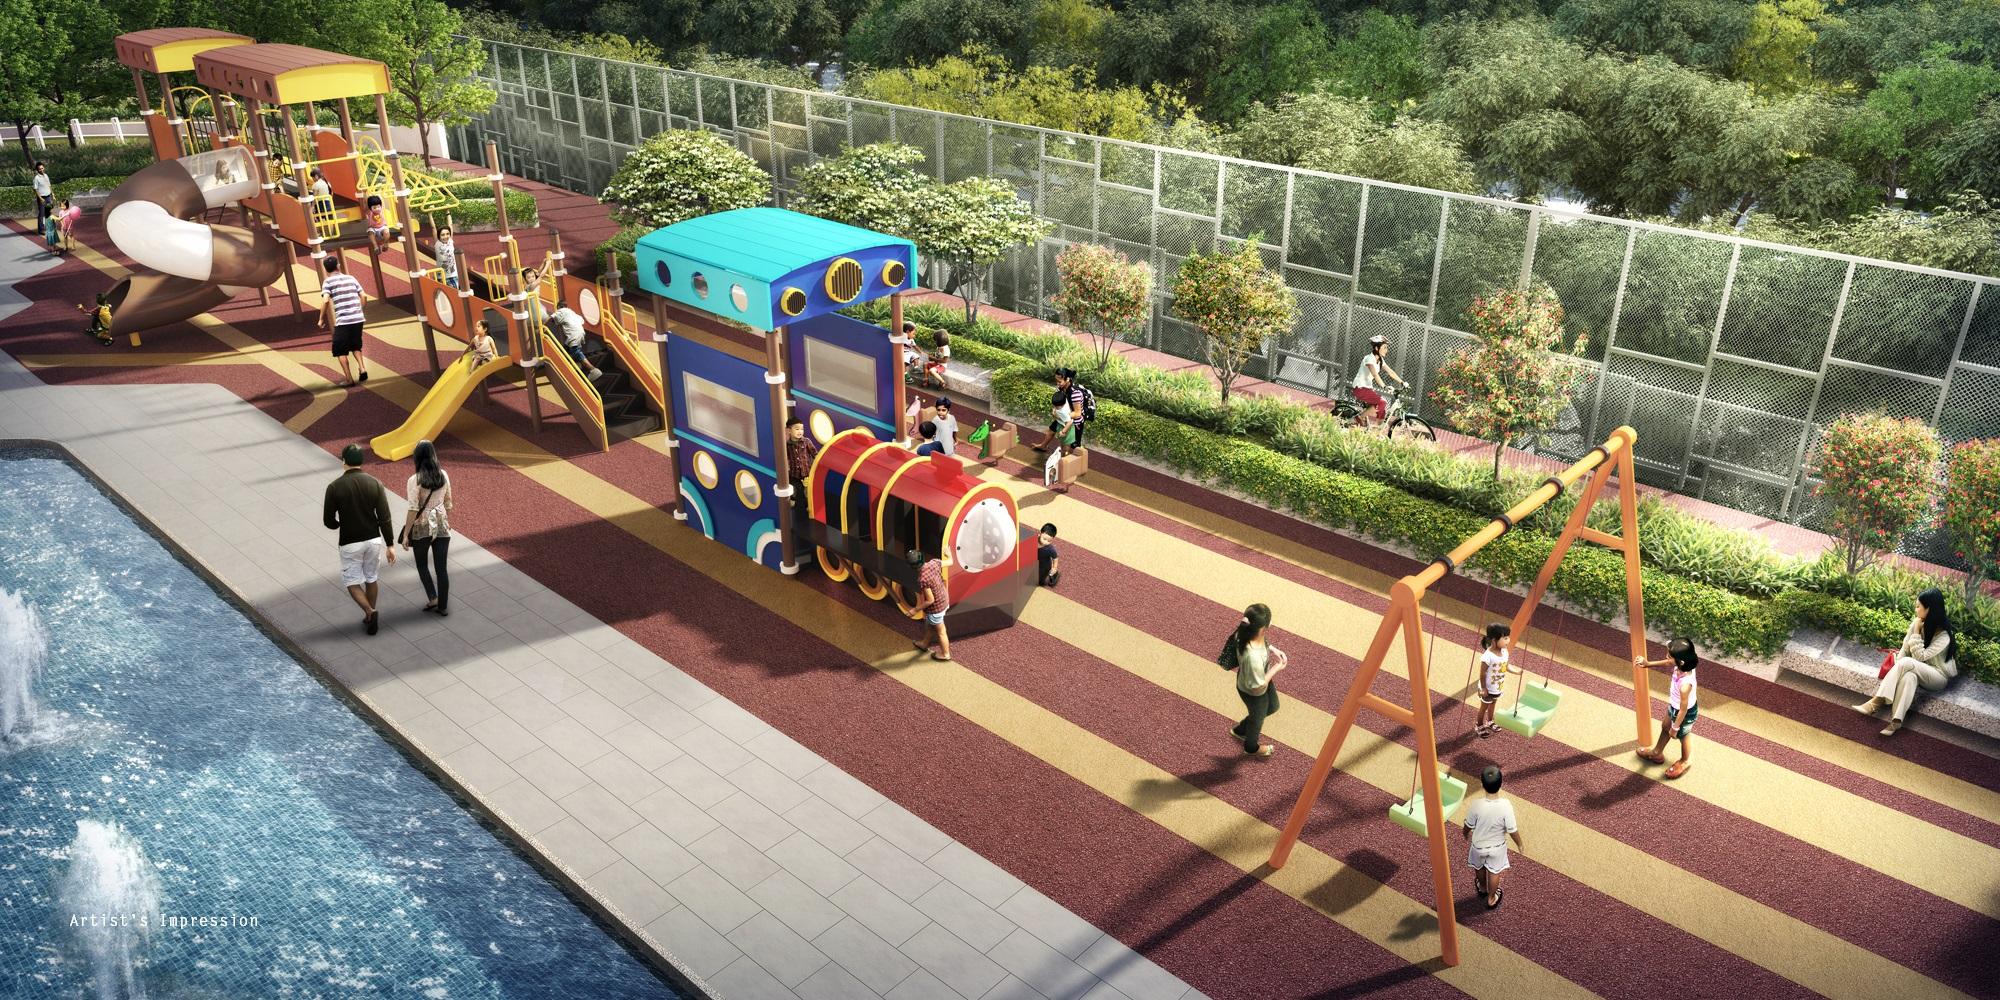 Westwood Kid's Playground